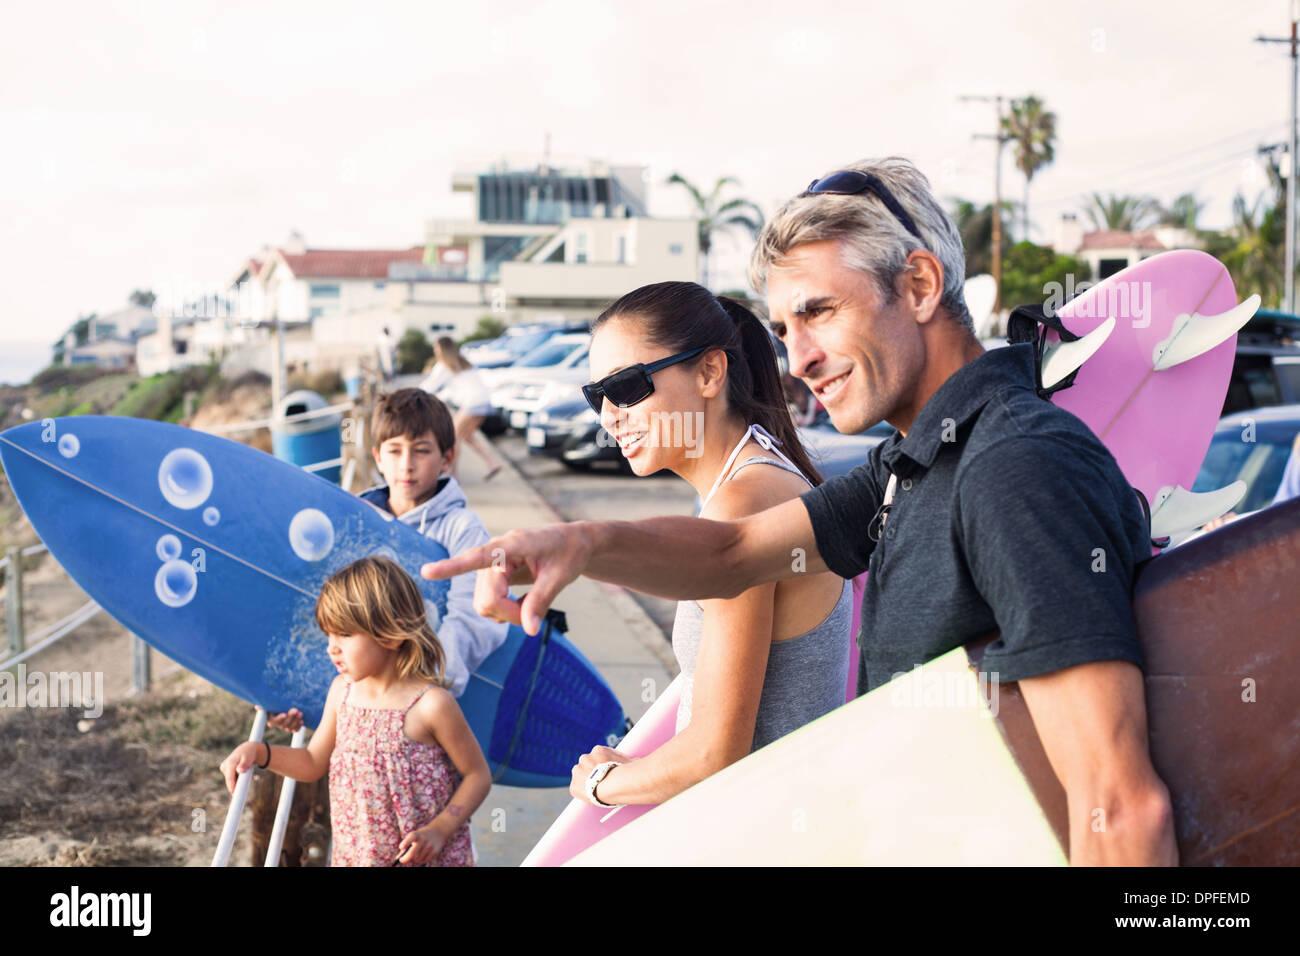 Family at coast with surfboards, Encinitas, California, USA - Stock Image